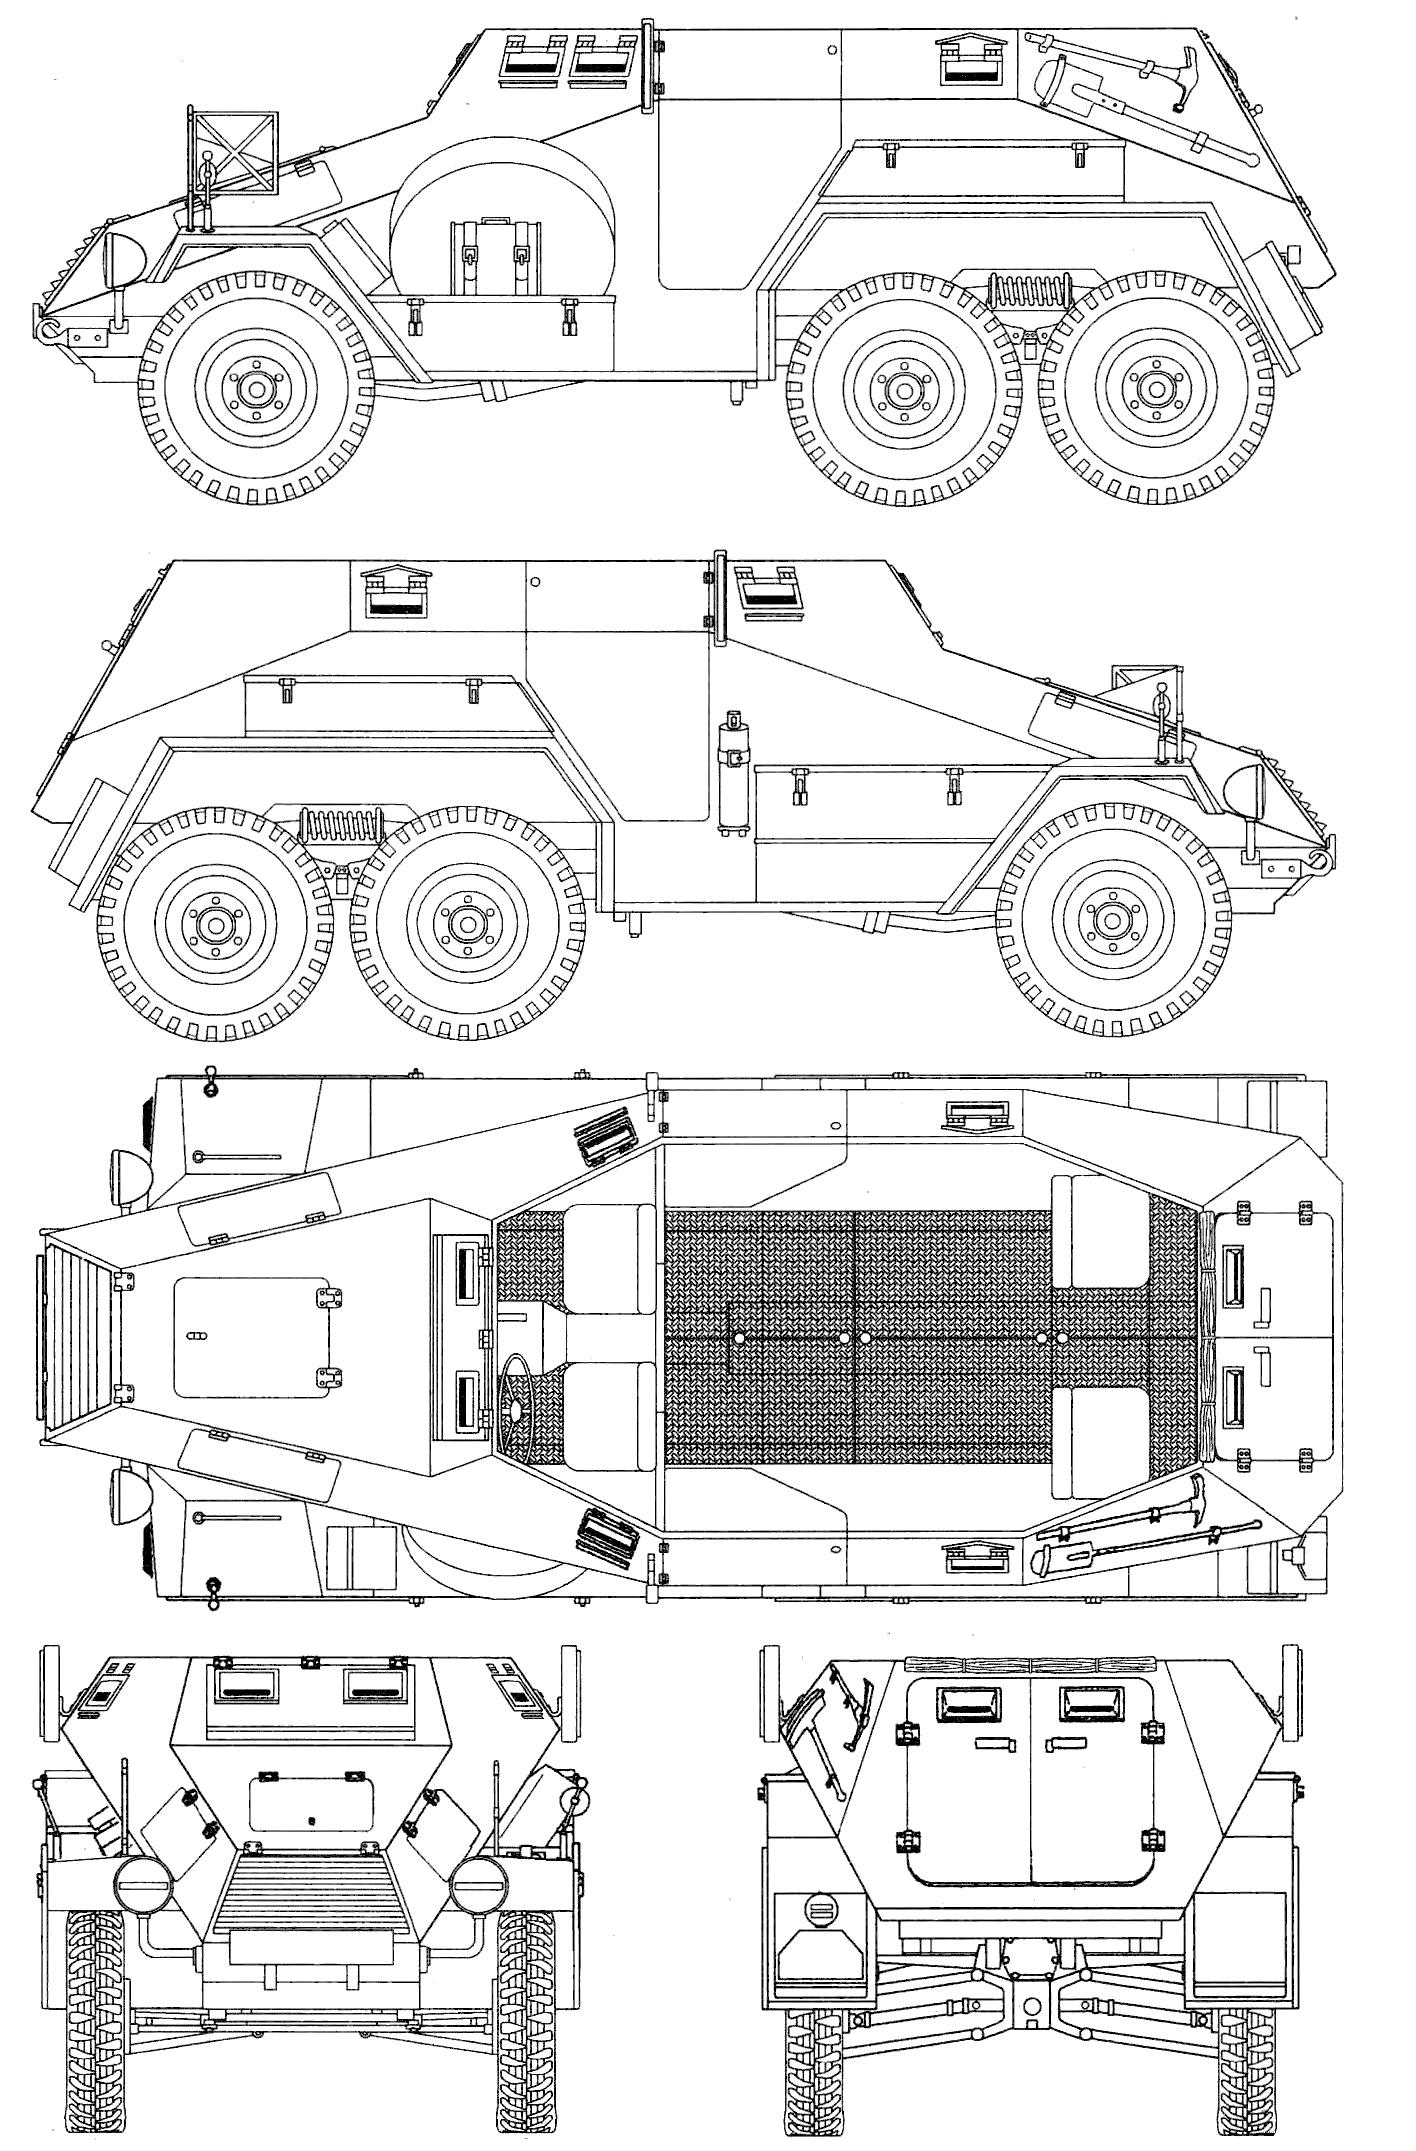 Sd.Kfz. 247 blueprint